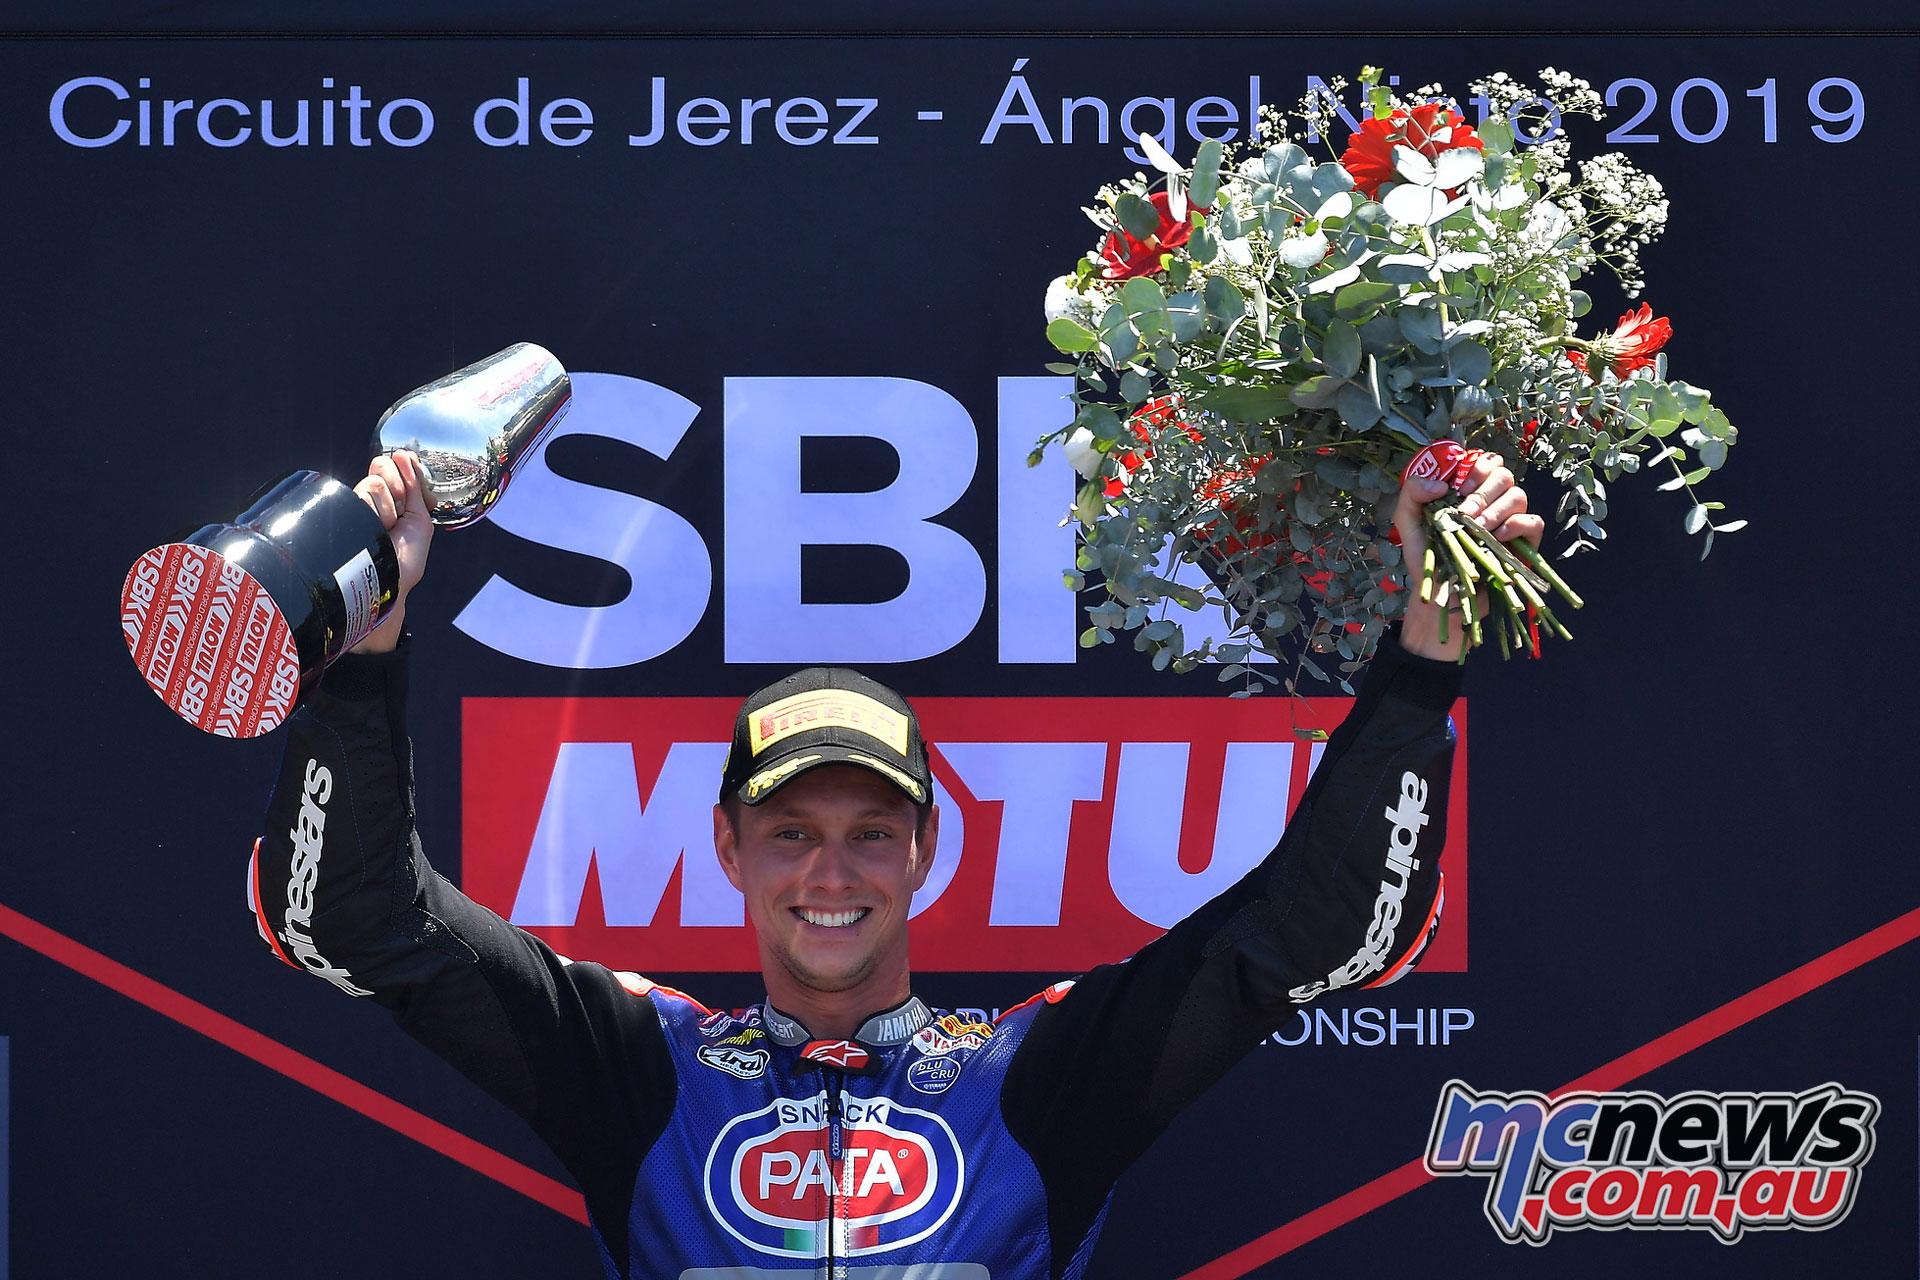 WSBK Rnd Jerez Sun Michael Van der Mark on the podium